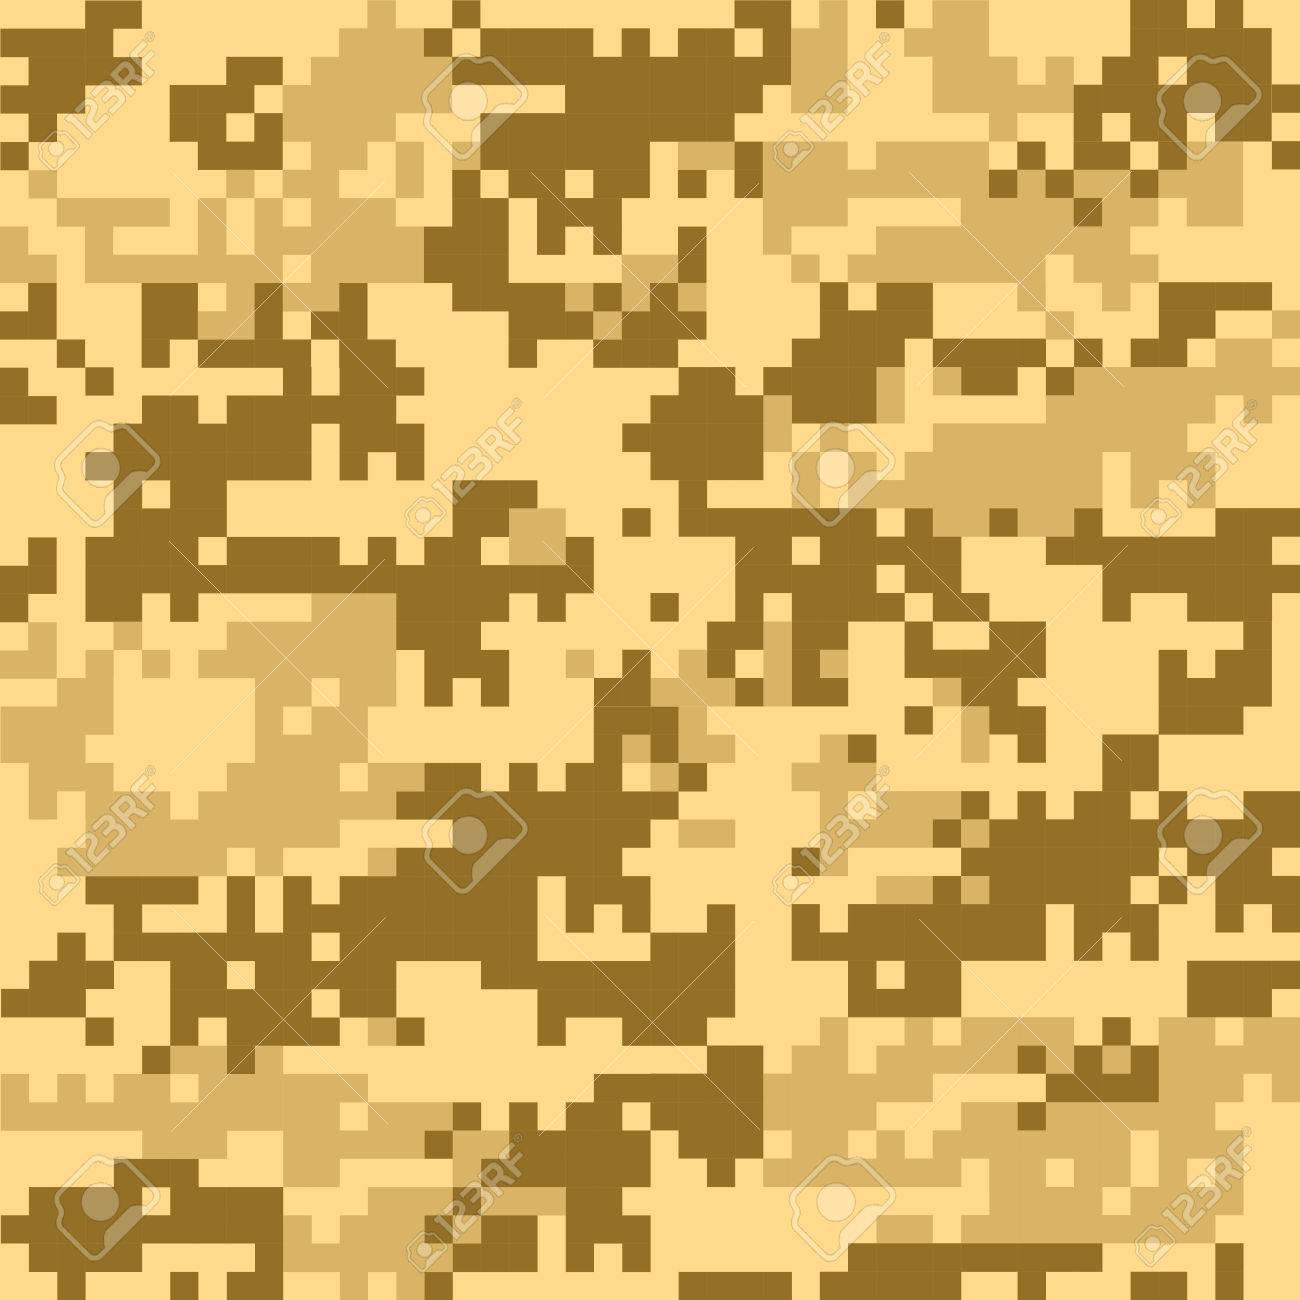 Digital Camouflage Seamless Patterns